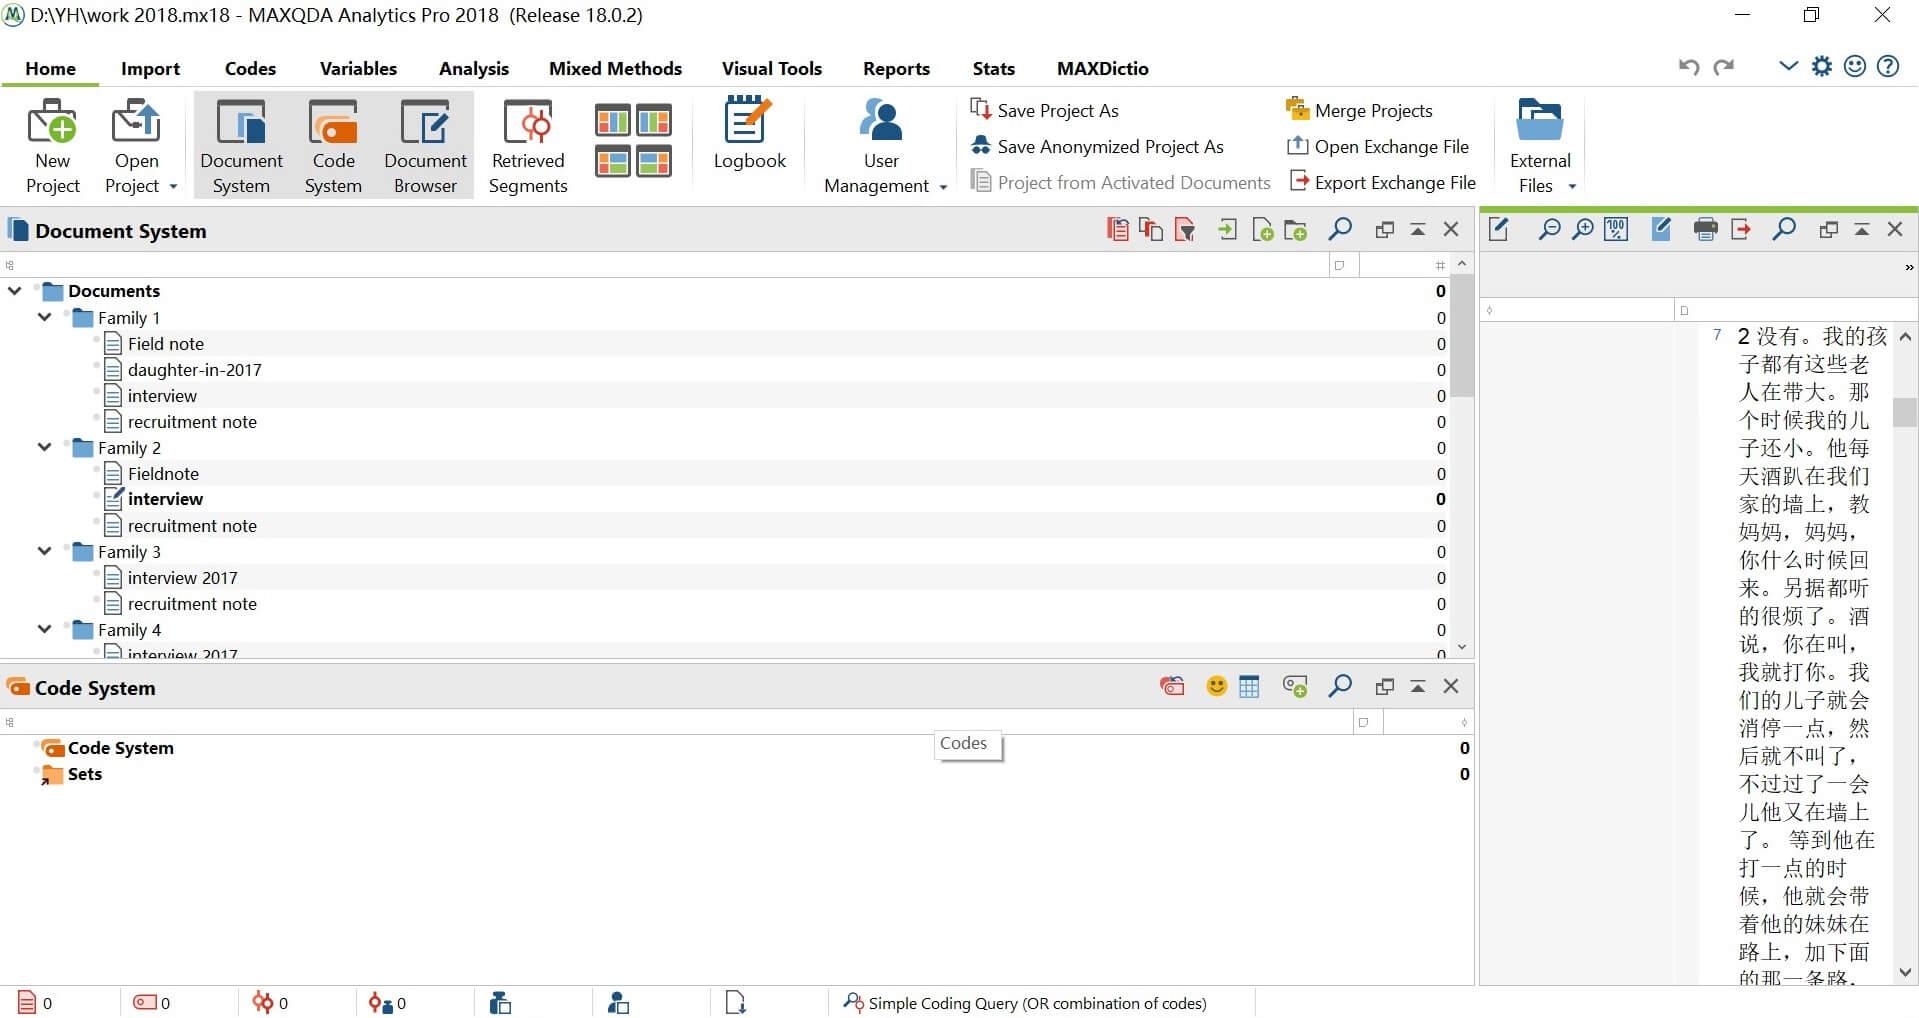 Organizing the data with MAXQDA